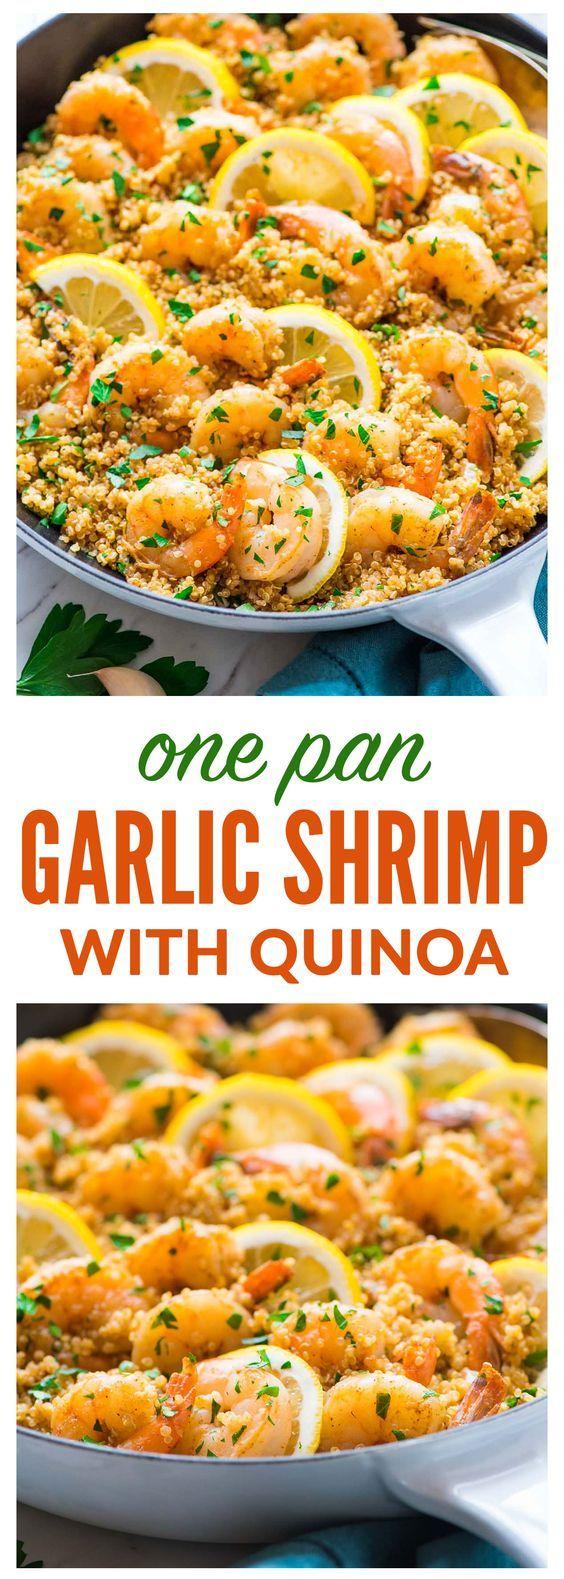 Photo of Garlic Shrimp with Quinoa